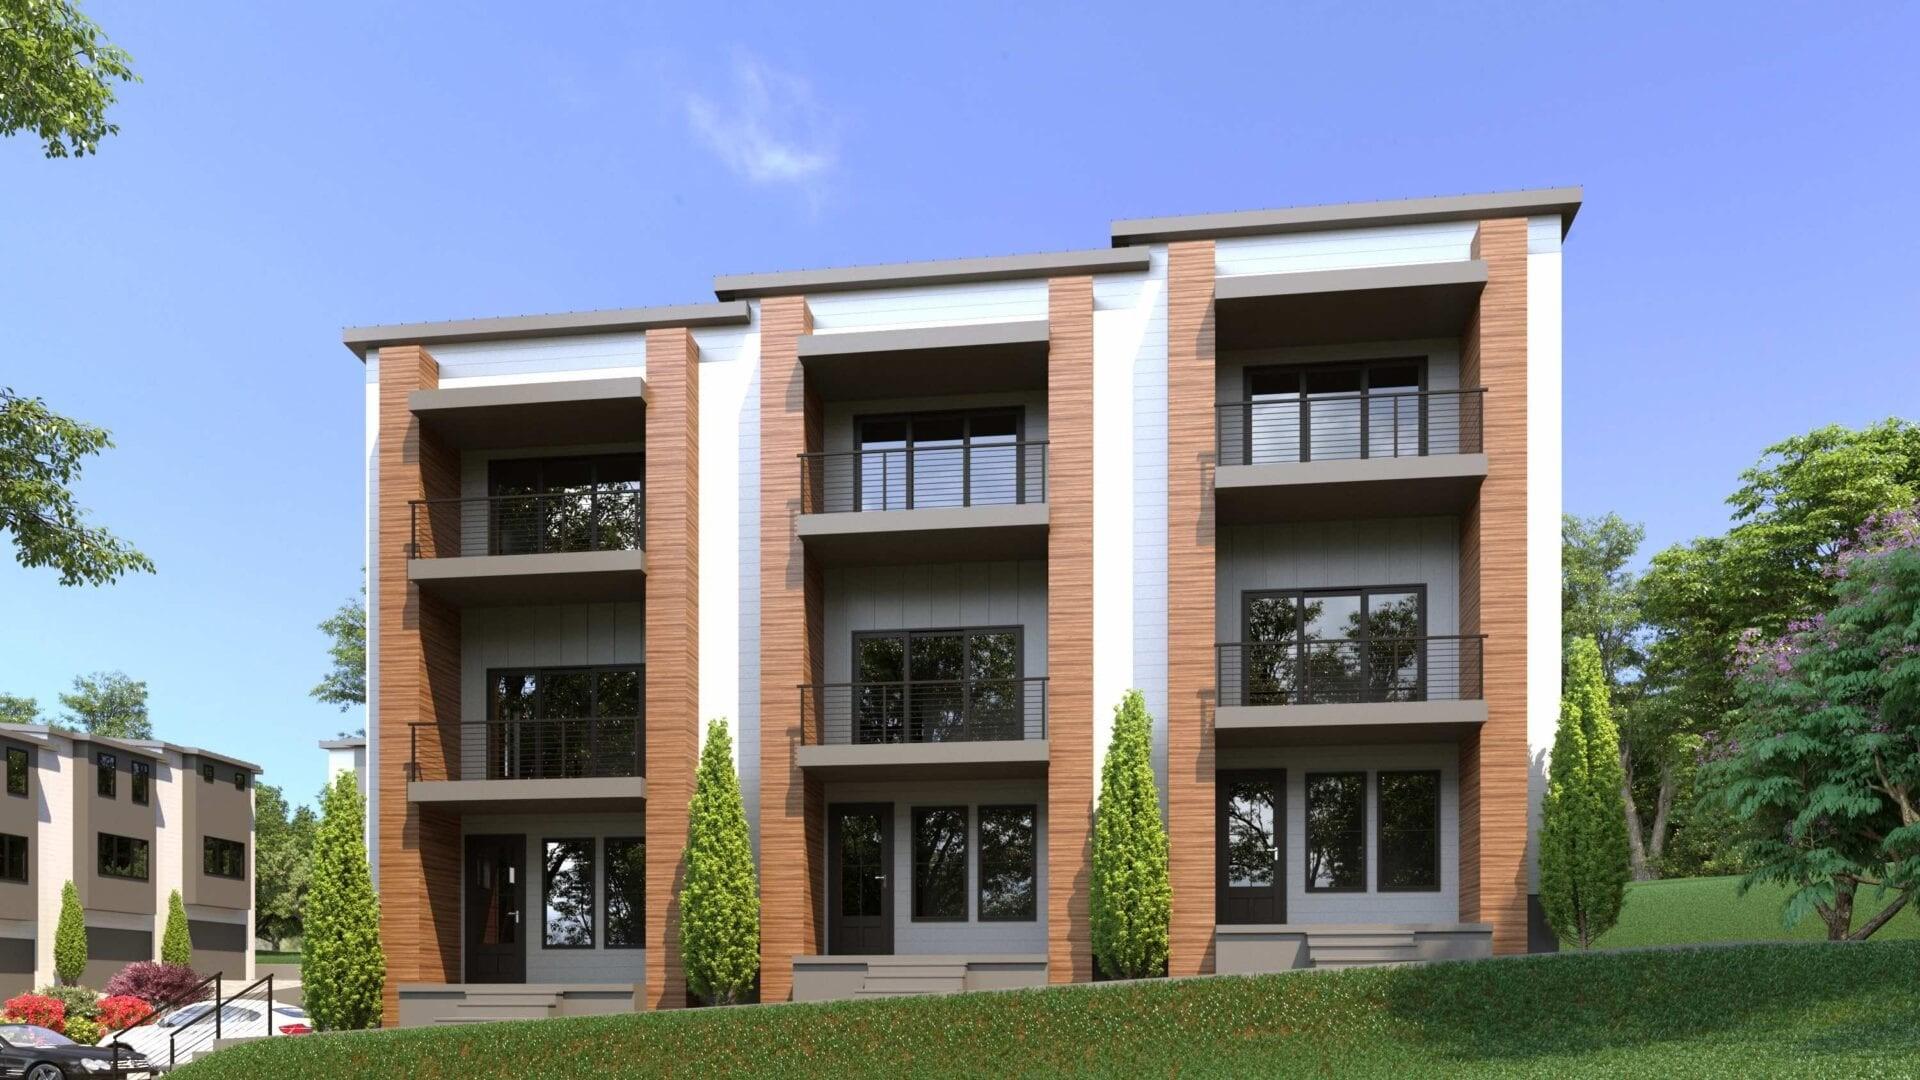 809 Watts Terrace 3 Property Photo - Nashville, TN real estate listing